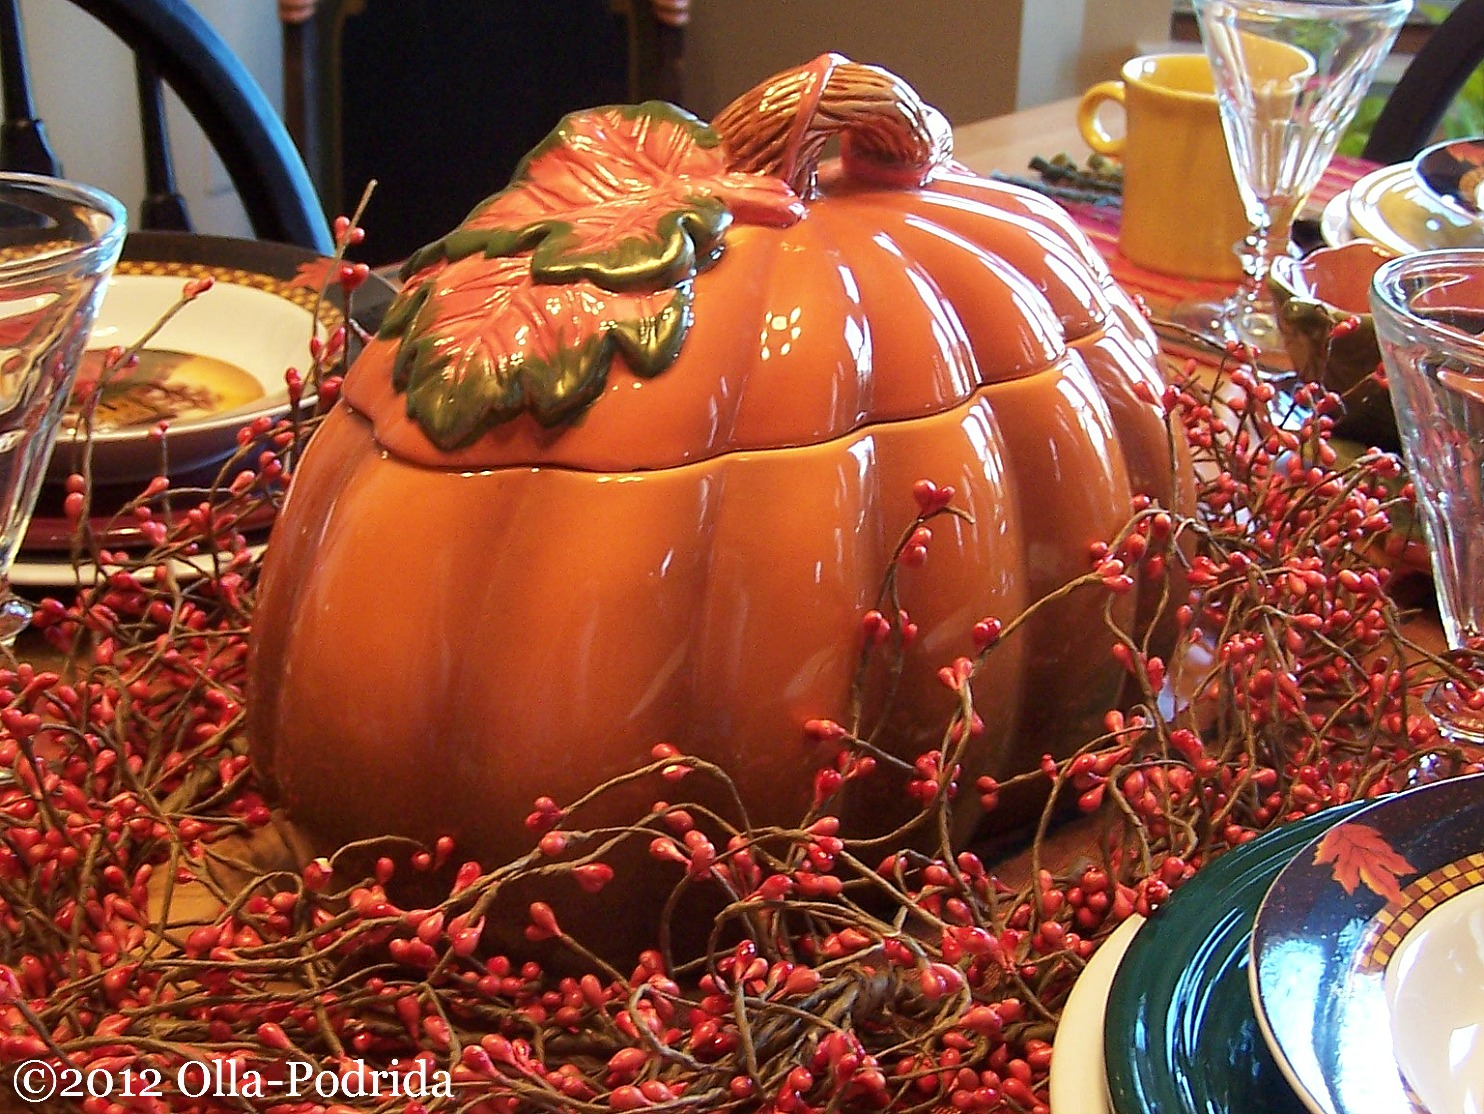 Wednesday October 17 2012 & Olla-Podrida: Autumn Harvest Table Setting